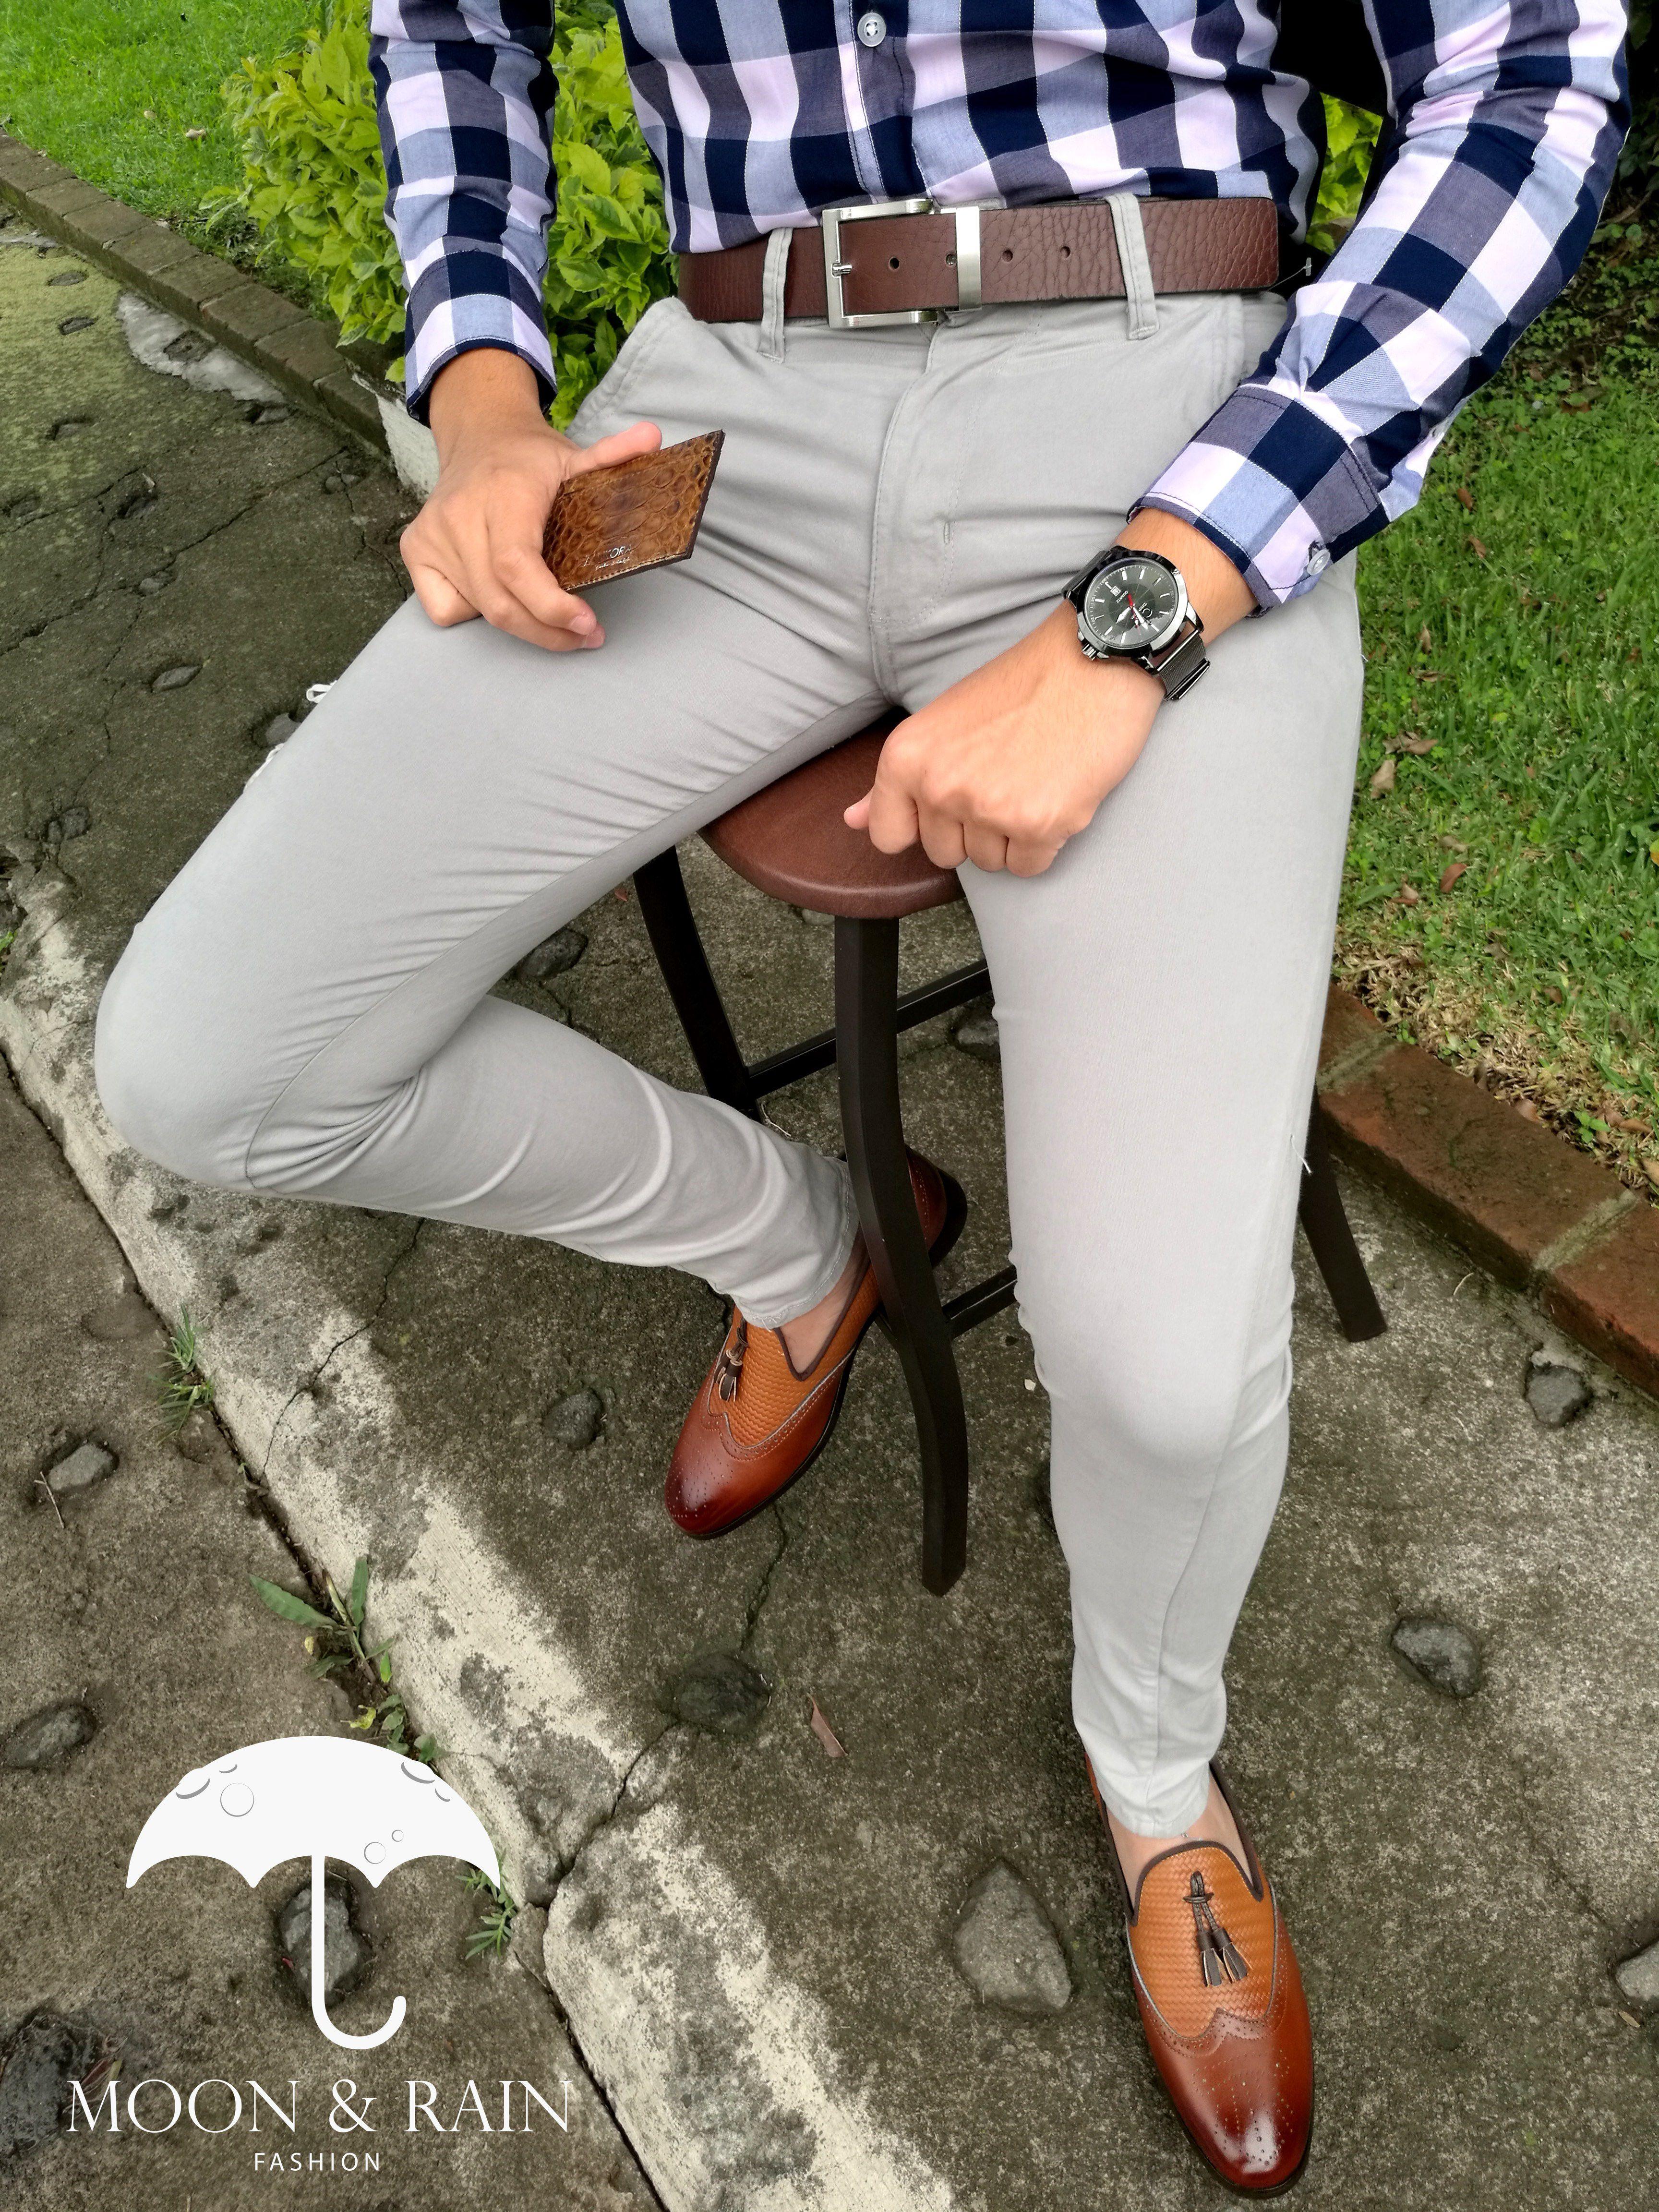 Outfit Para Hombre Camisa De Cuadro Azul Y Rosa Slim Fit Cinturon Cafe Pantalon De Gabardina Gris Camisa Gris Hombre Moda Ropa Hombre Combinar Ropa Hombre